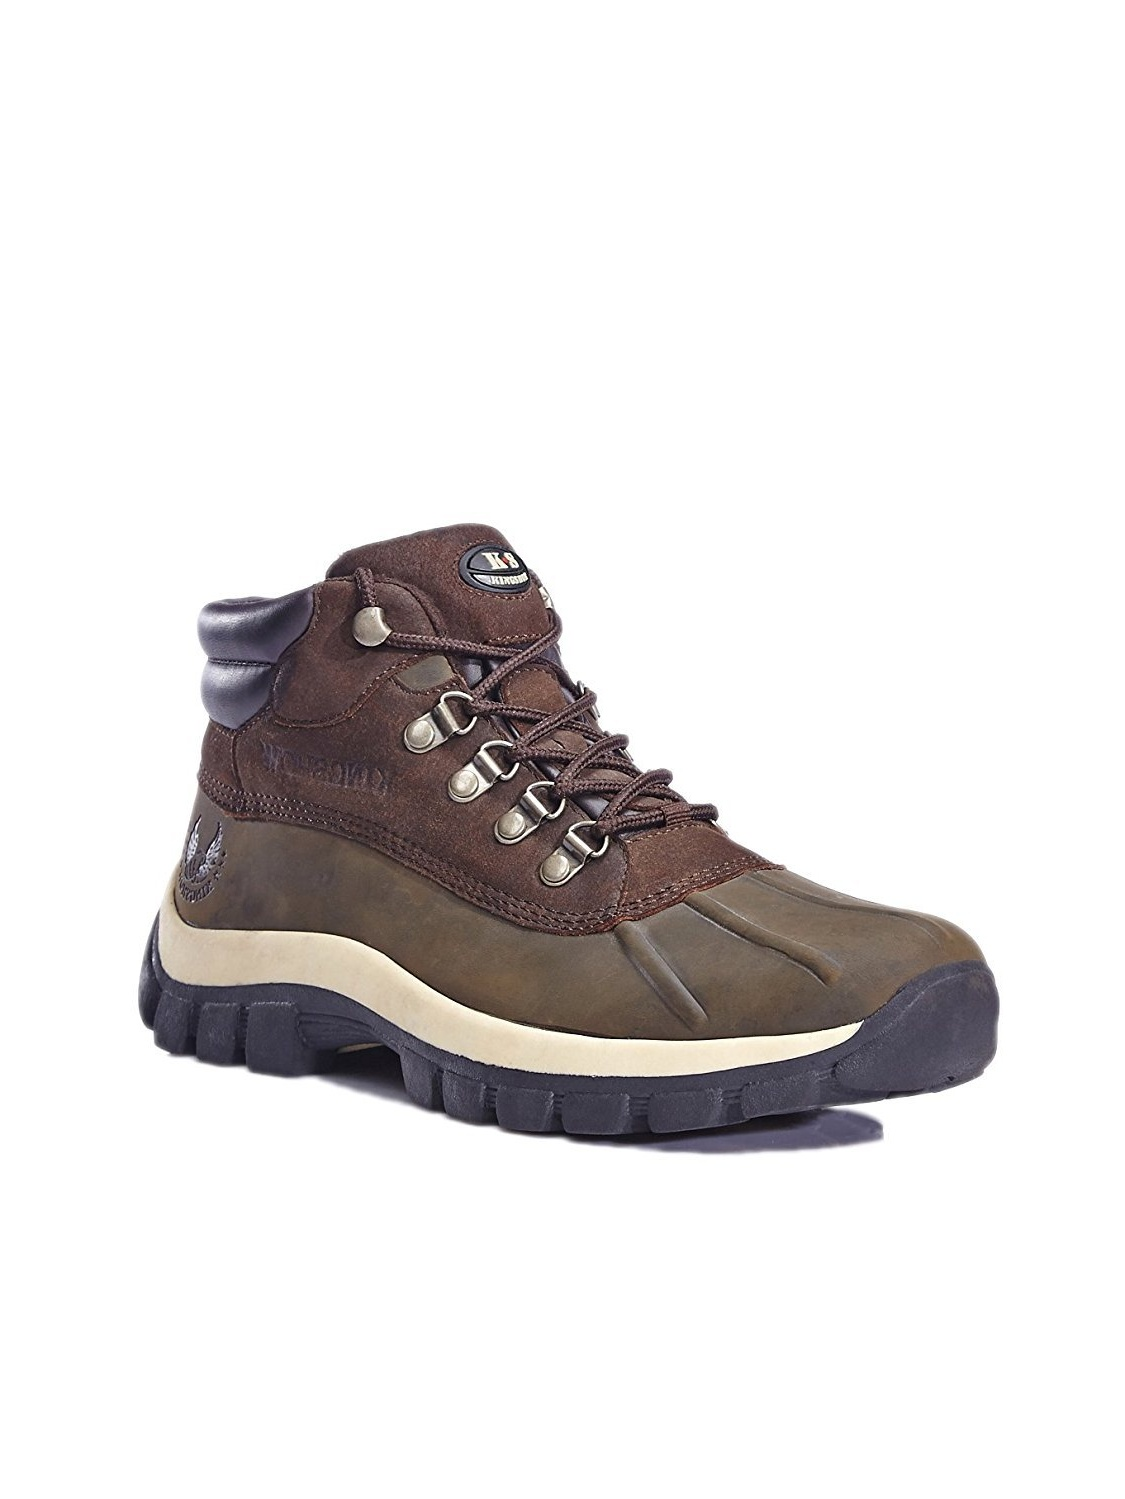 KINGSHOW Mens M0705 Water Resistance Leather Rubber Sole Winter Snow Boots Black 1428-2 / 8 D(M) US